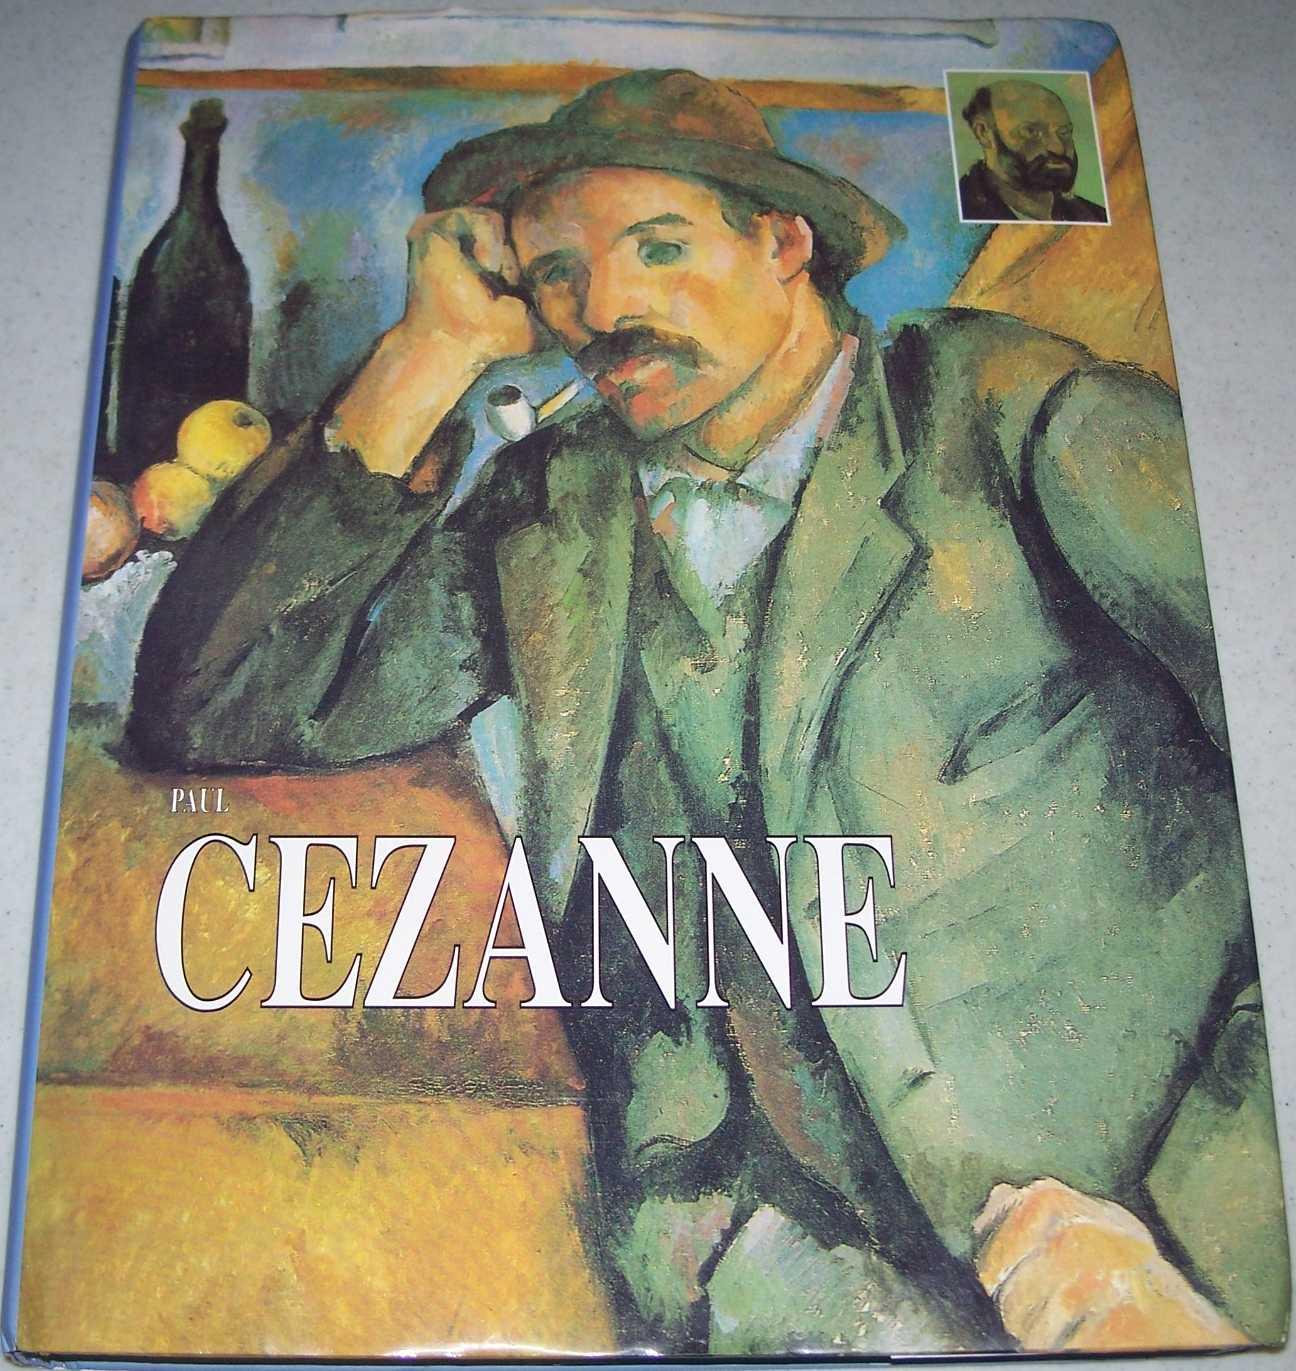 Paul Cezanne, George, Serge